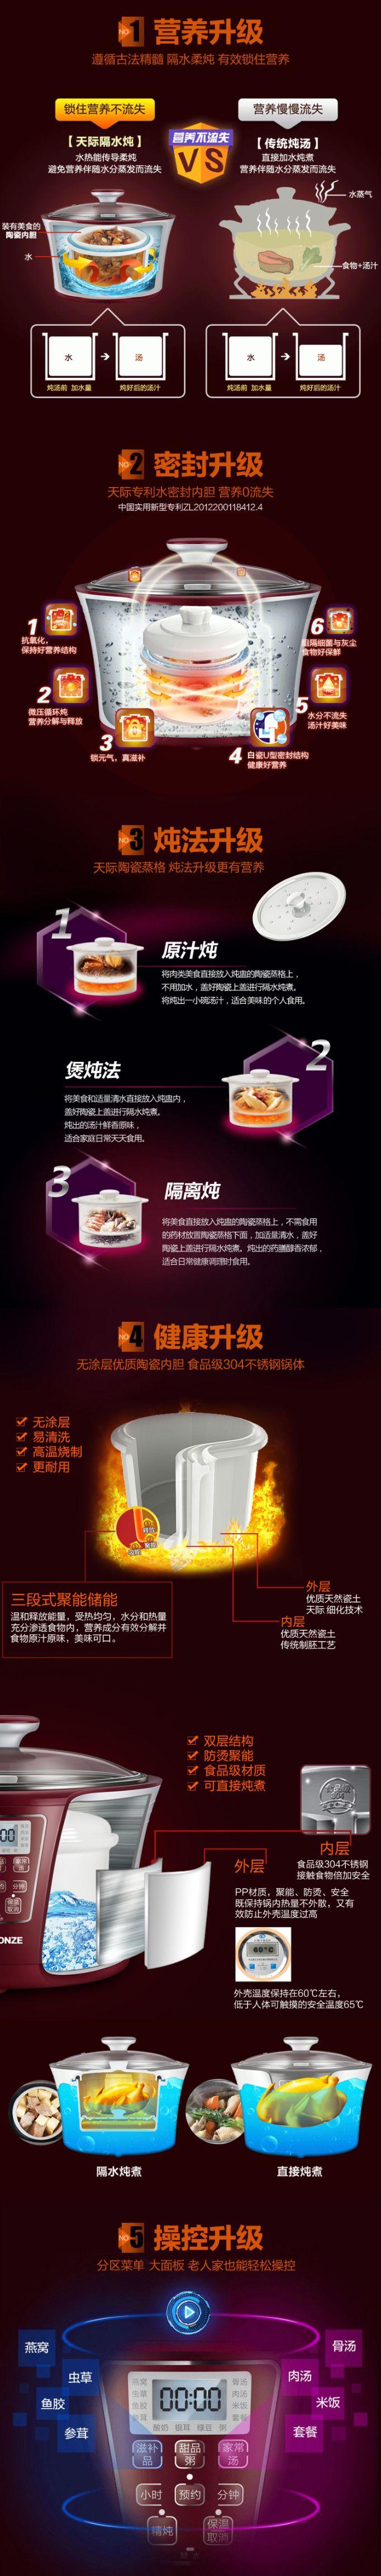 Tonze 天际 DGD32-32EG 1锅4胆 陶瓷内胆 全自动隔水电炖锅 113.99加元包邮!